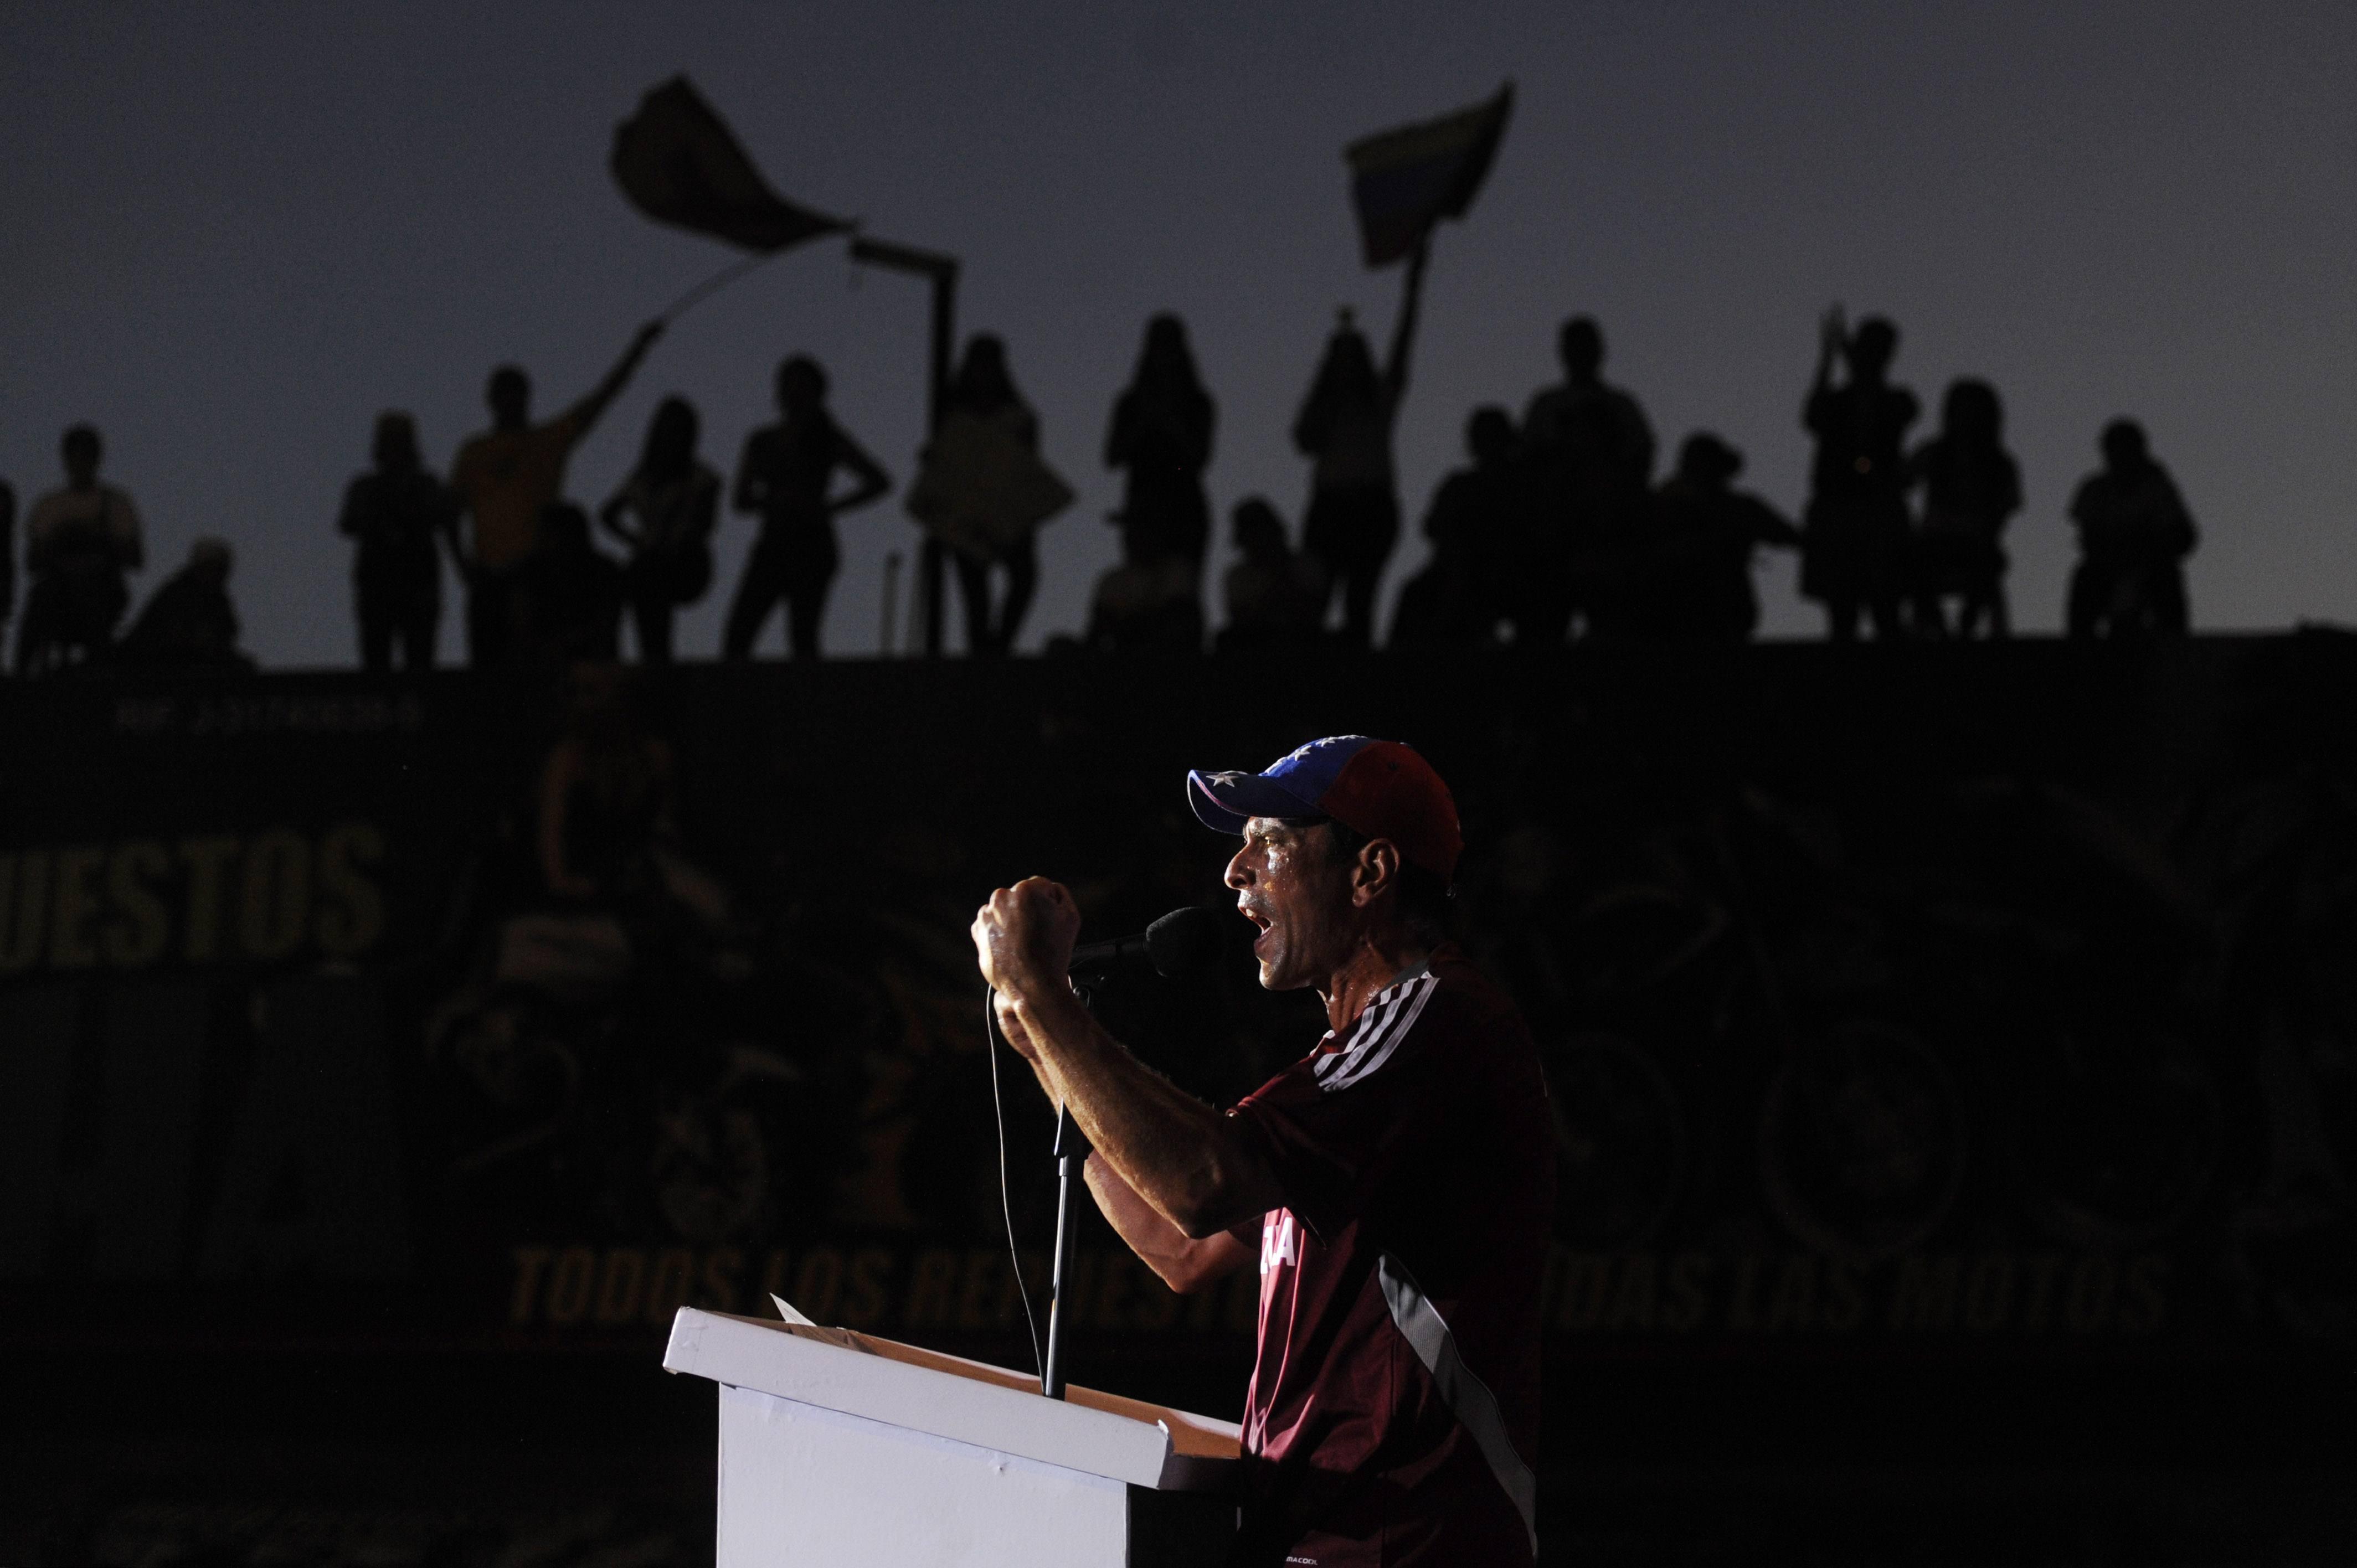 Venezuelan opposition presidential candidate Henrique Capriles Radonski delivers a speech in Maturin